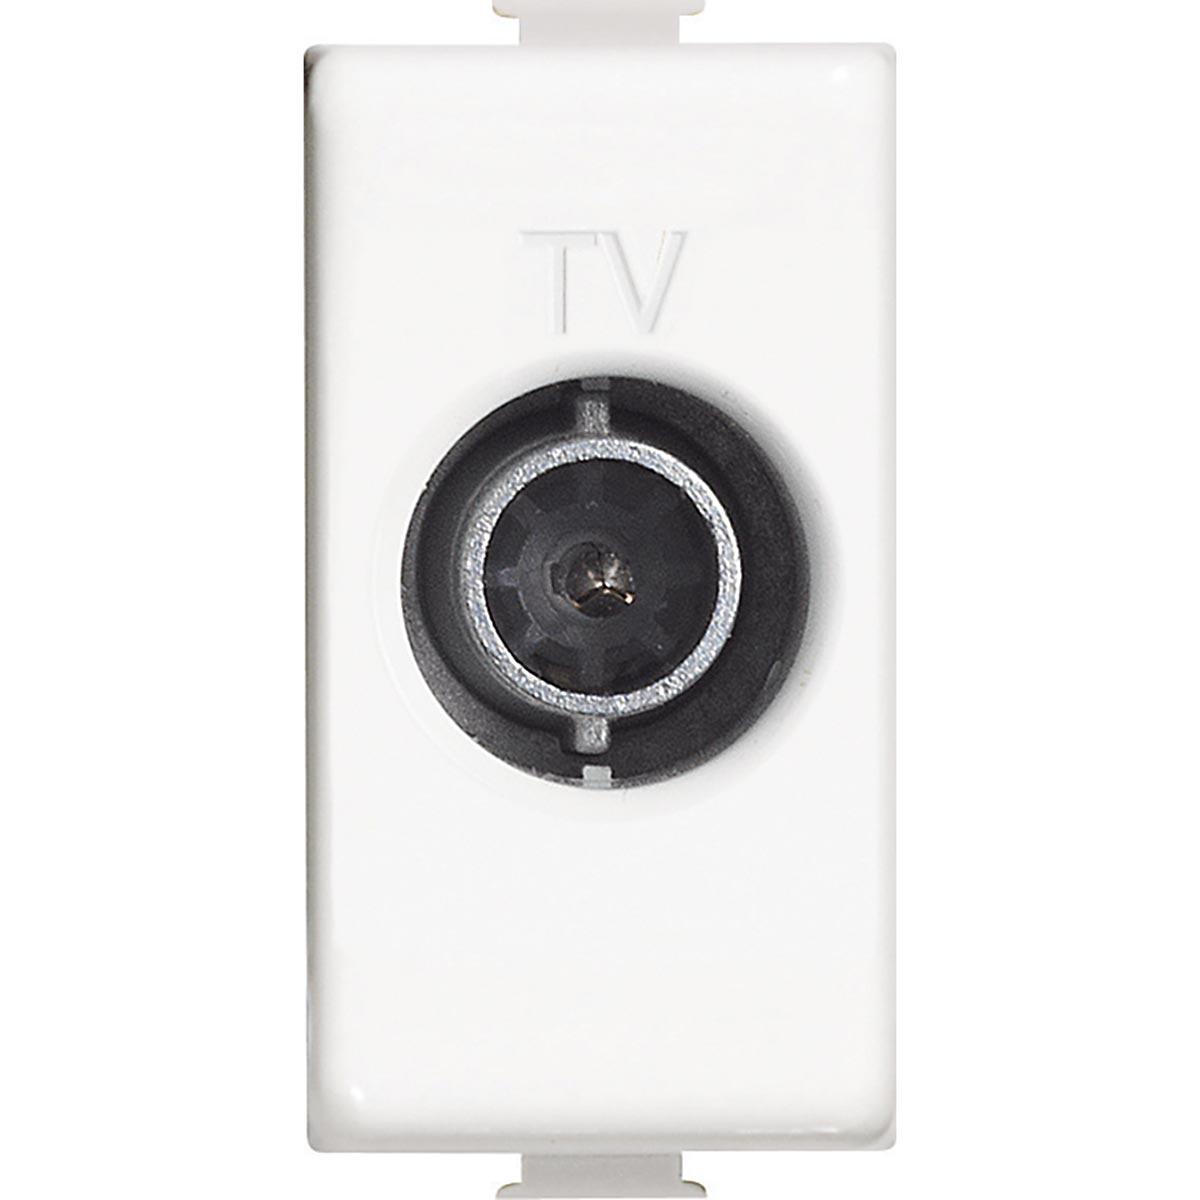 Matix bticino presa tv derivata AM5202D